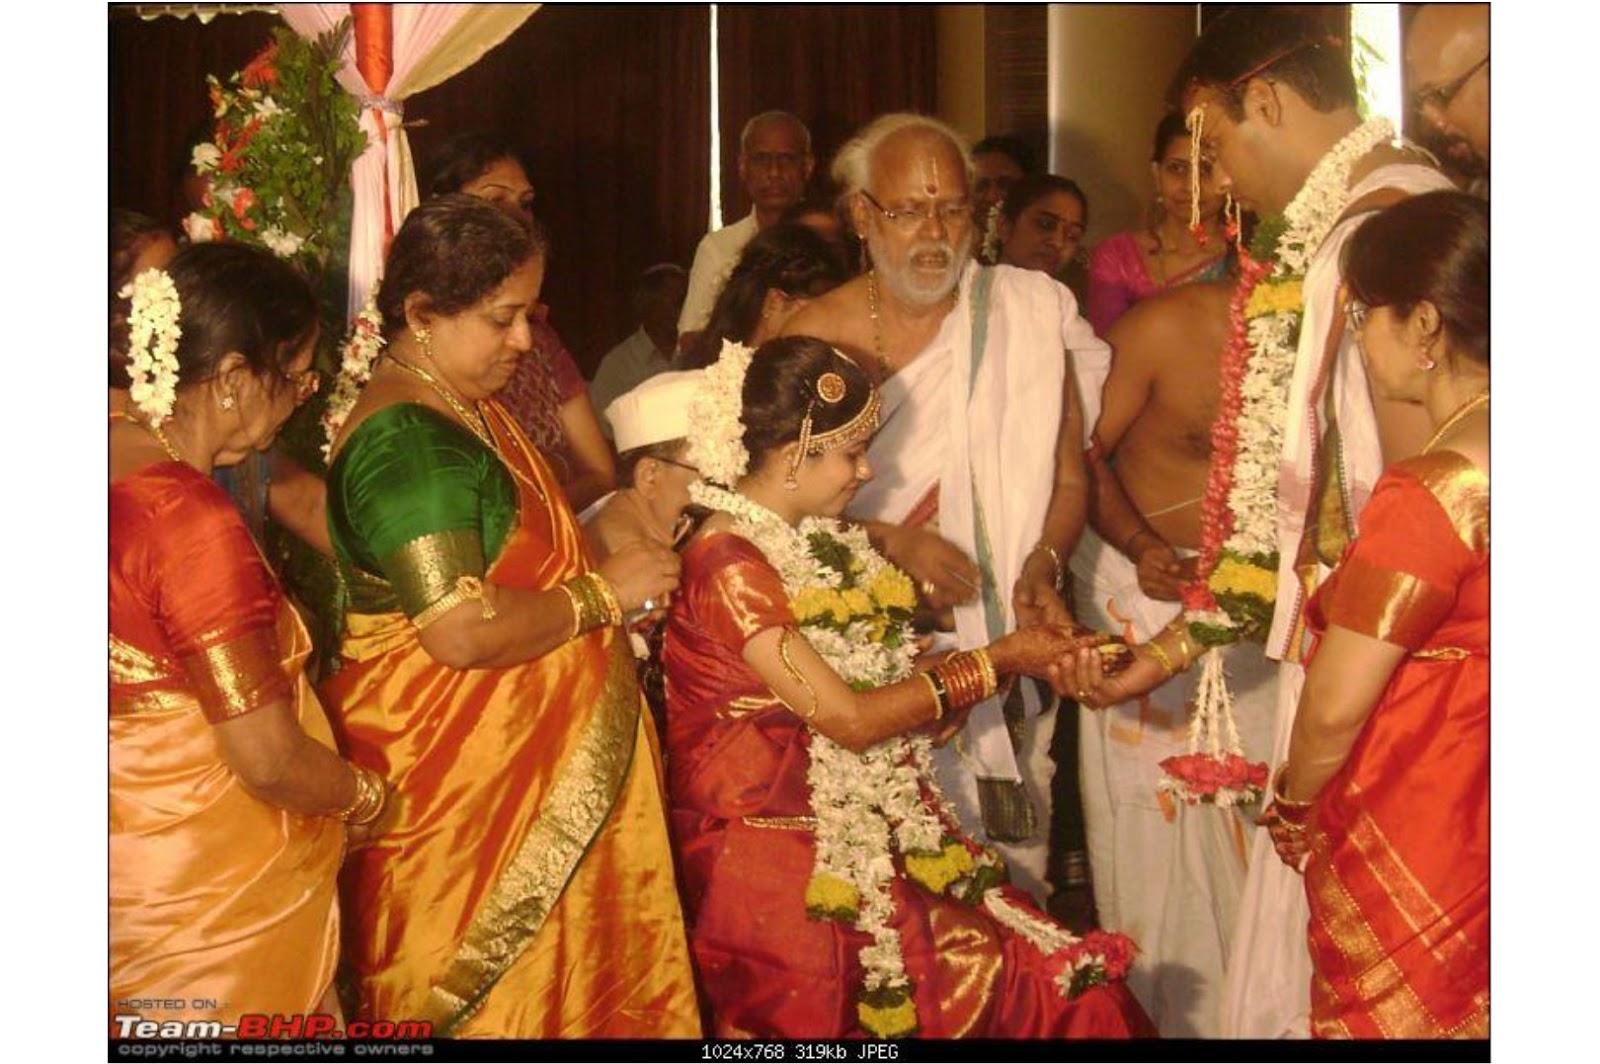 Essential Elements Of The Hindu Wedding Ceremony